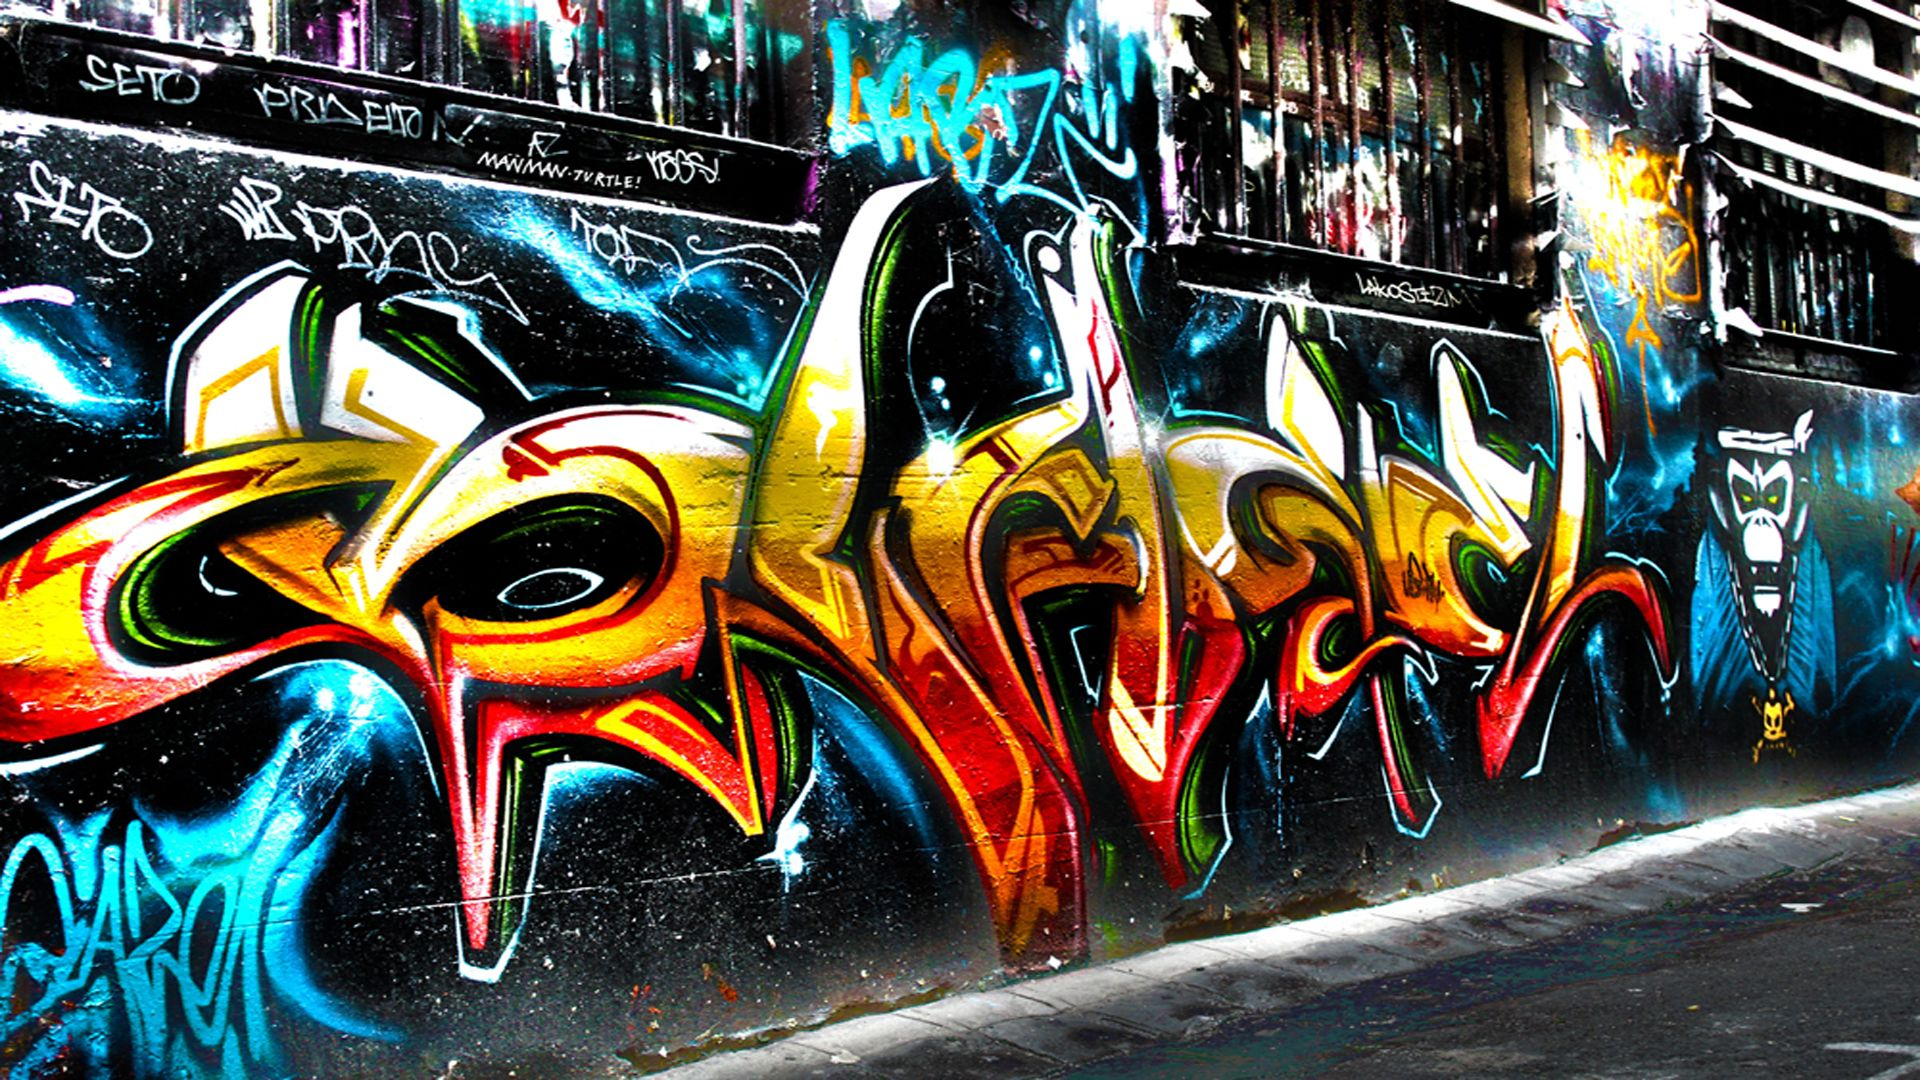 Graffiti_wallpaper__wallpapers_hd Graffiti Drawing Graffiti Art Graffiti Pictures Best Graffiti Graffiti Tagging